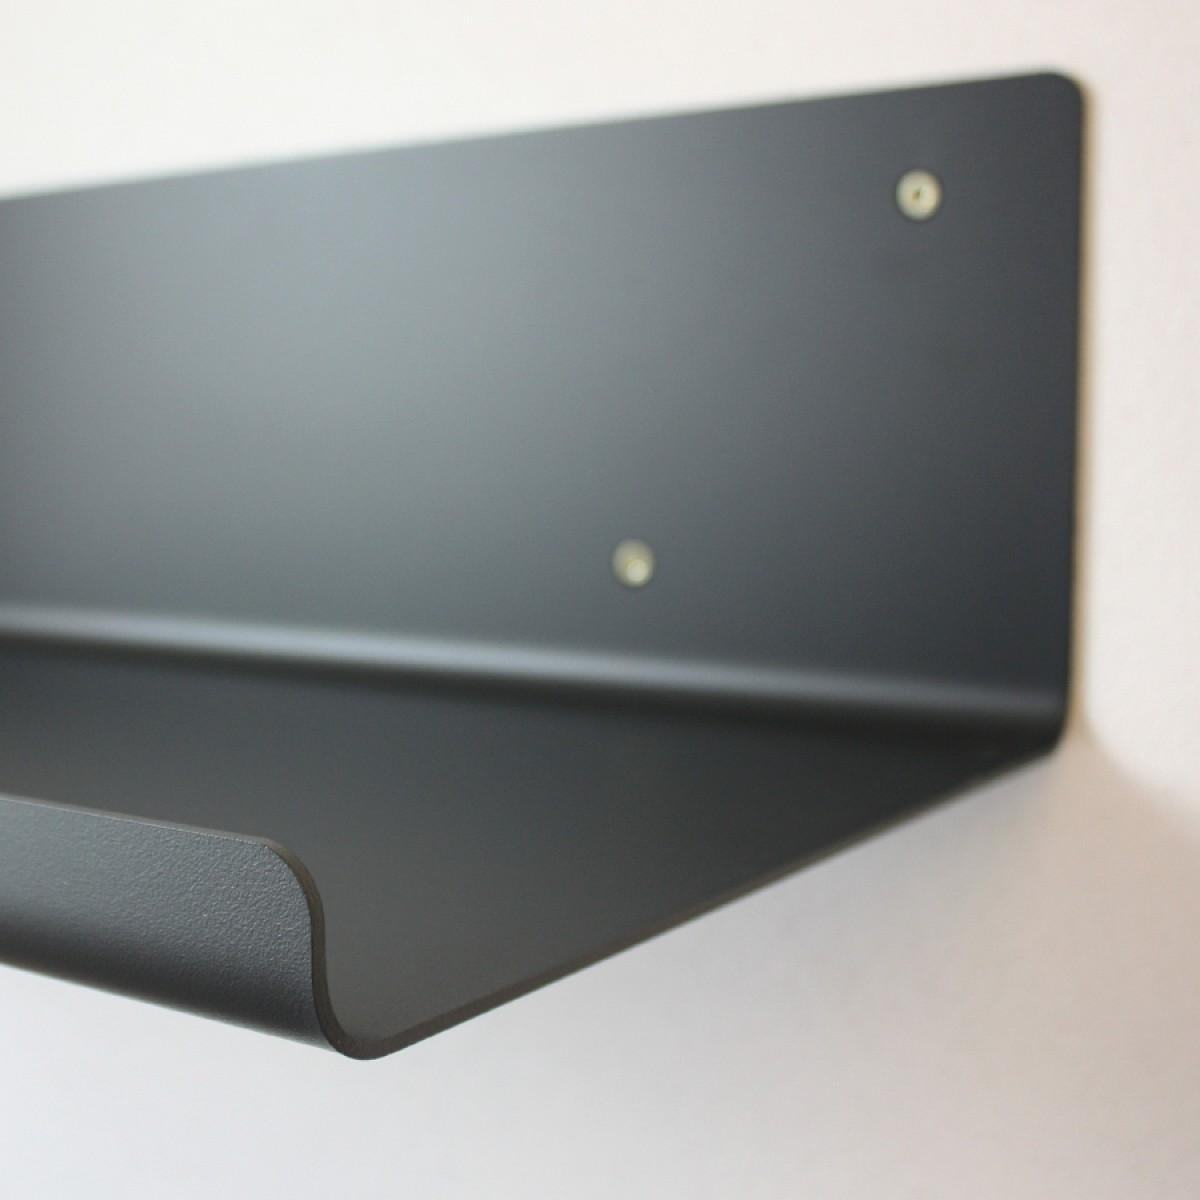 pet board - Straight - Design Katzenmöbel aus Metall